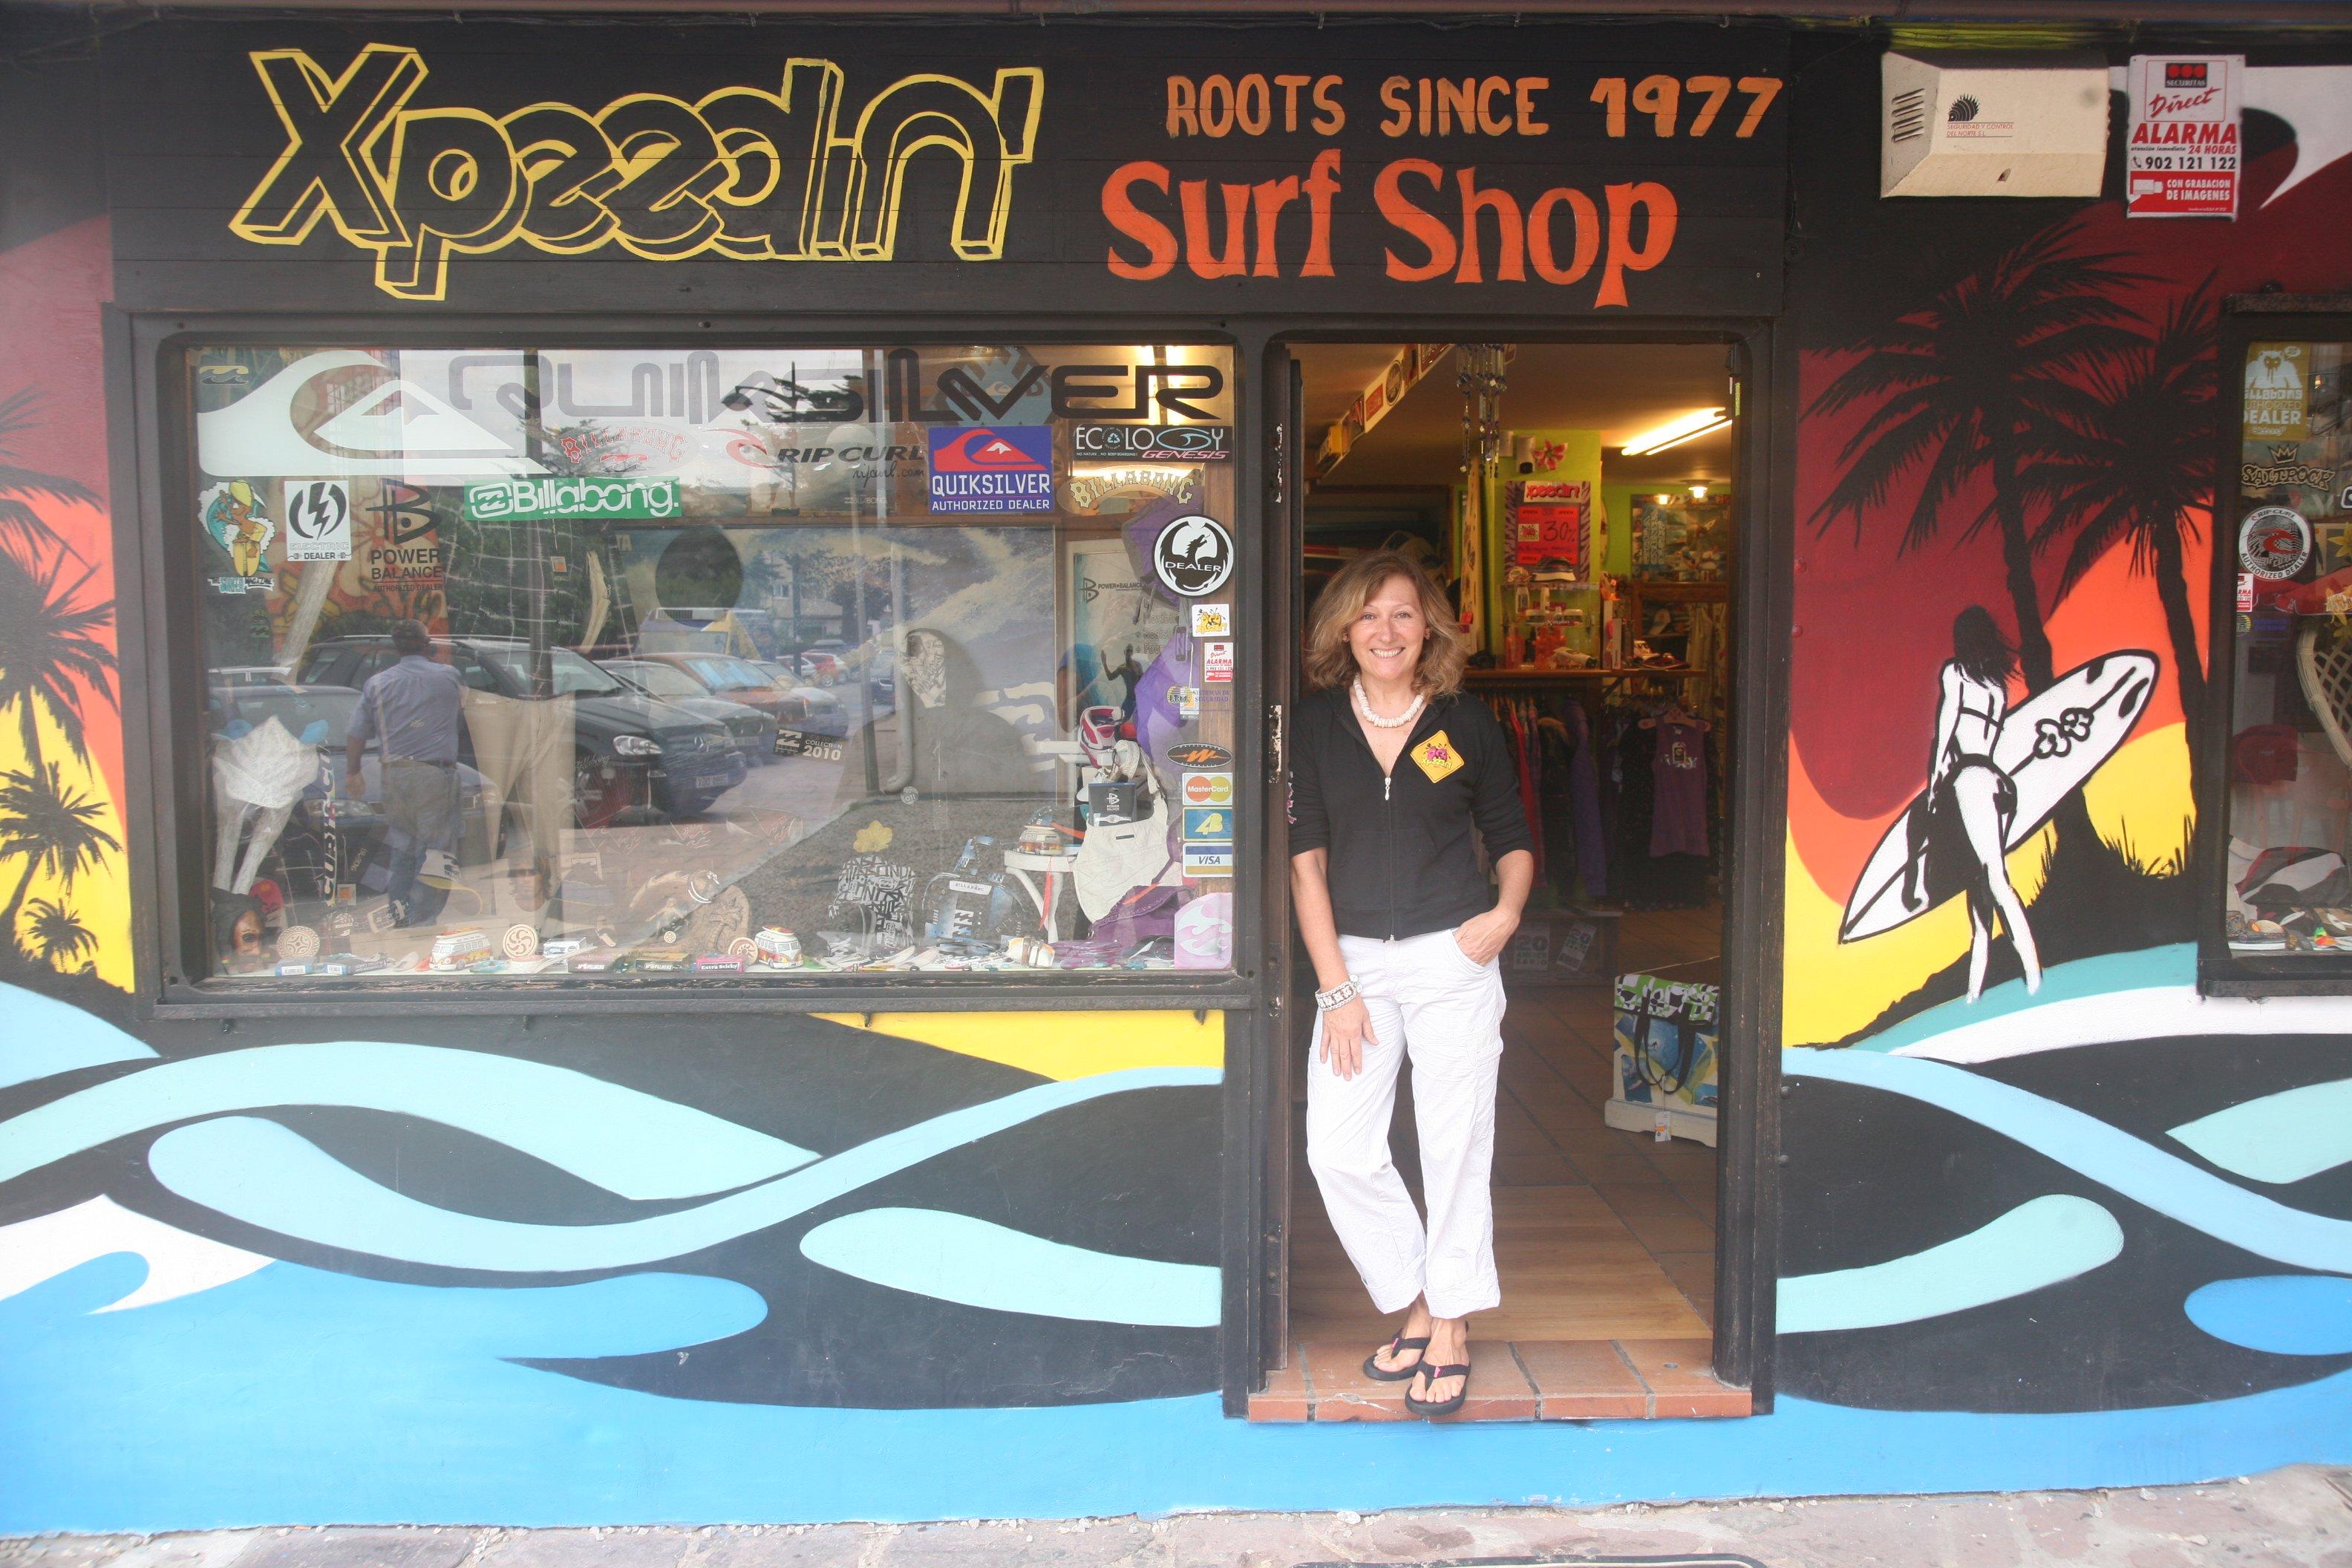 xpeedin surf shop